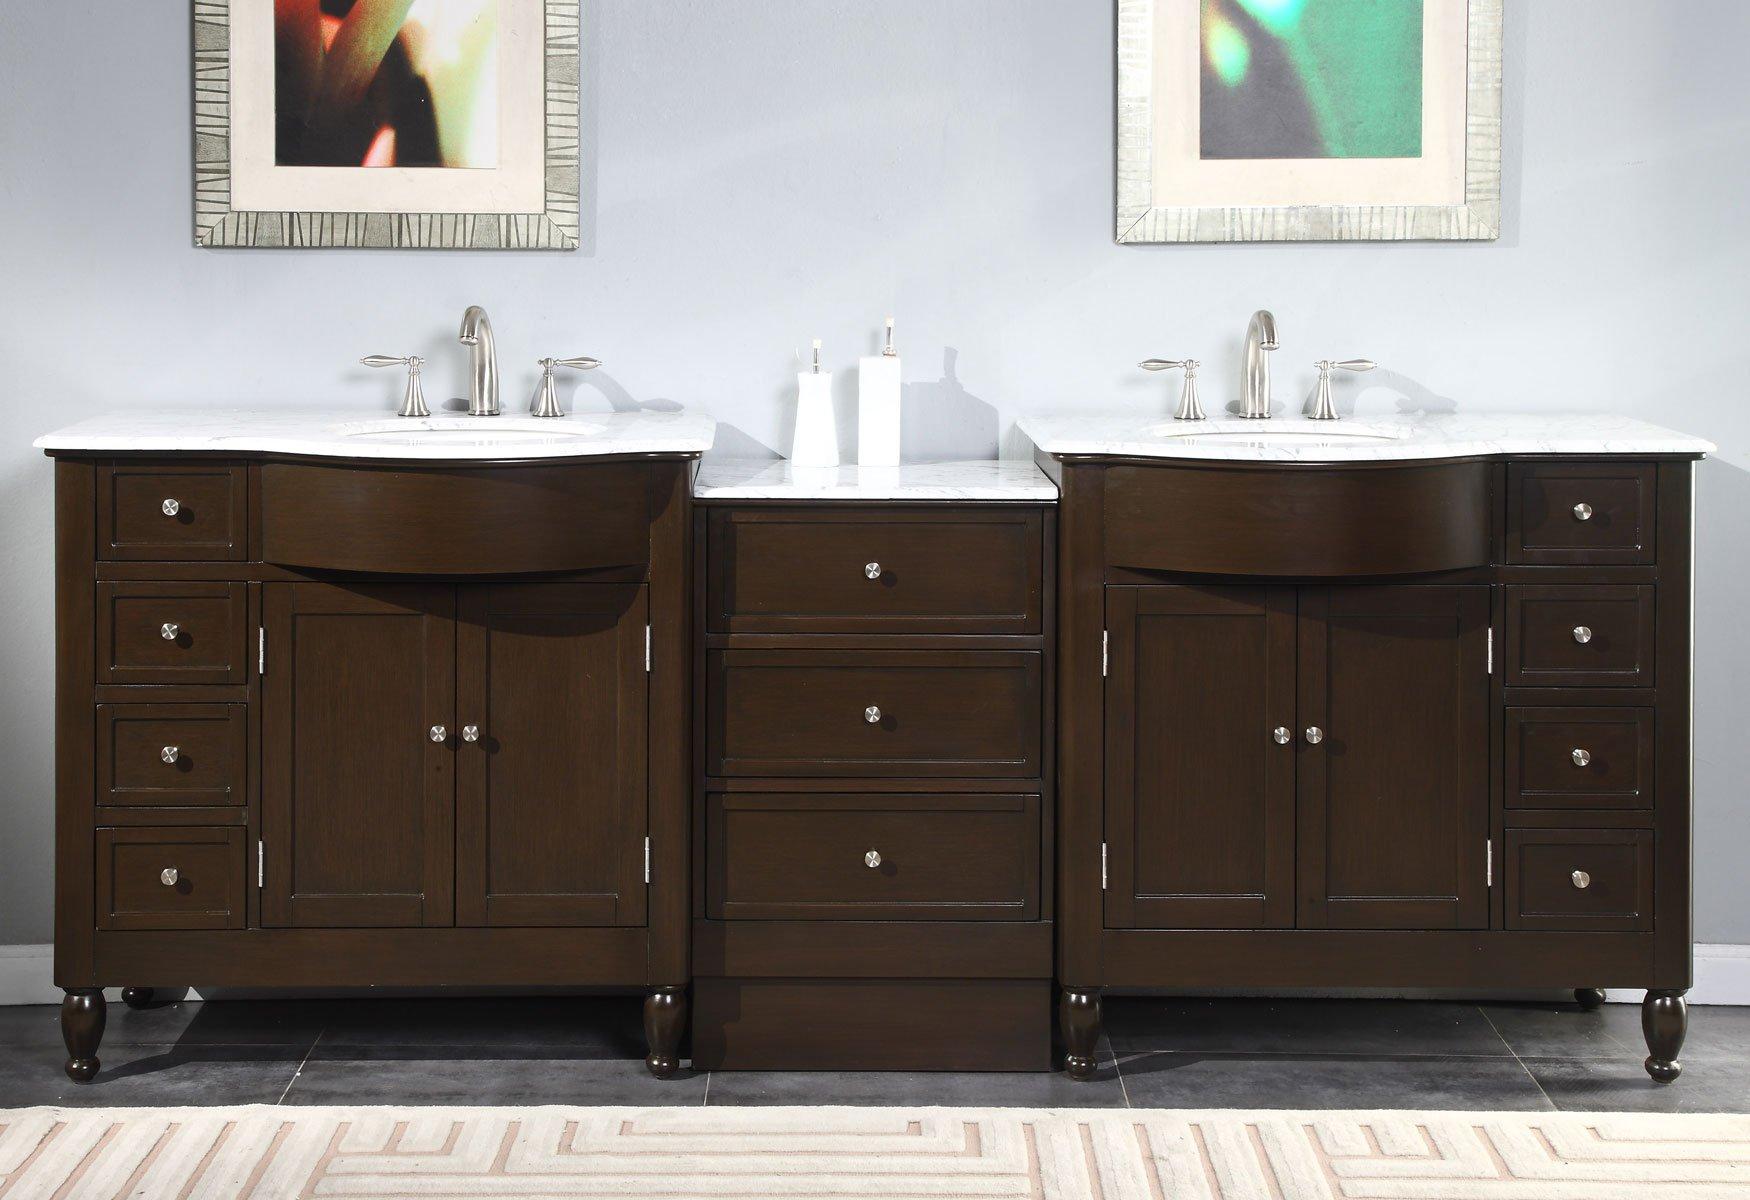 Silkroad Exclusive Marble Stone Top Double Sink Bathroom Vanity with Dark Walnut Cabinet, 95-Inch